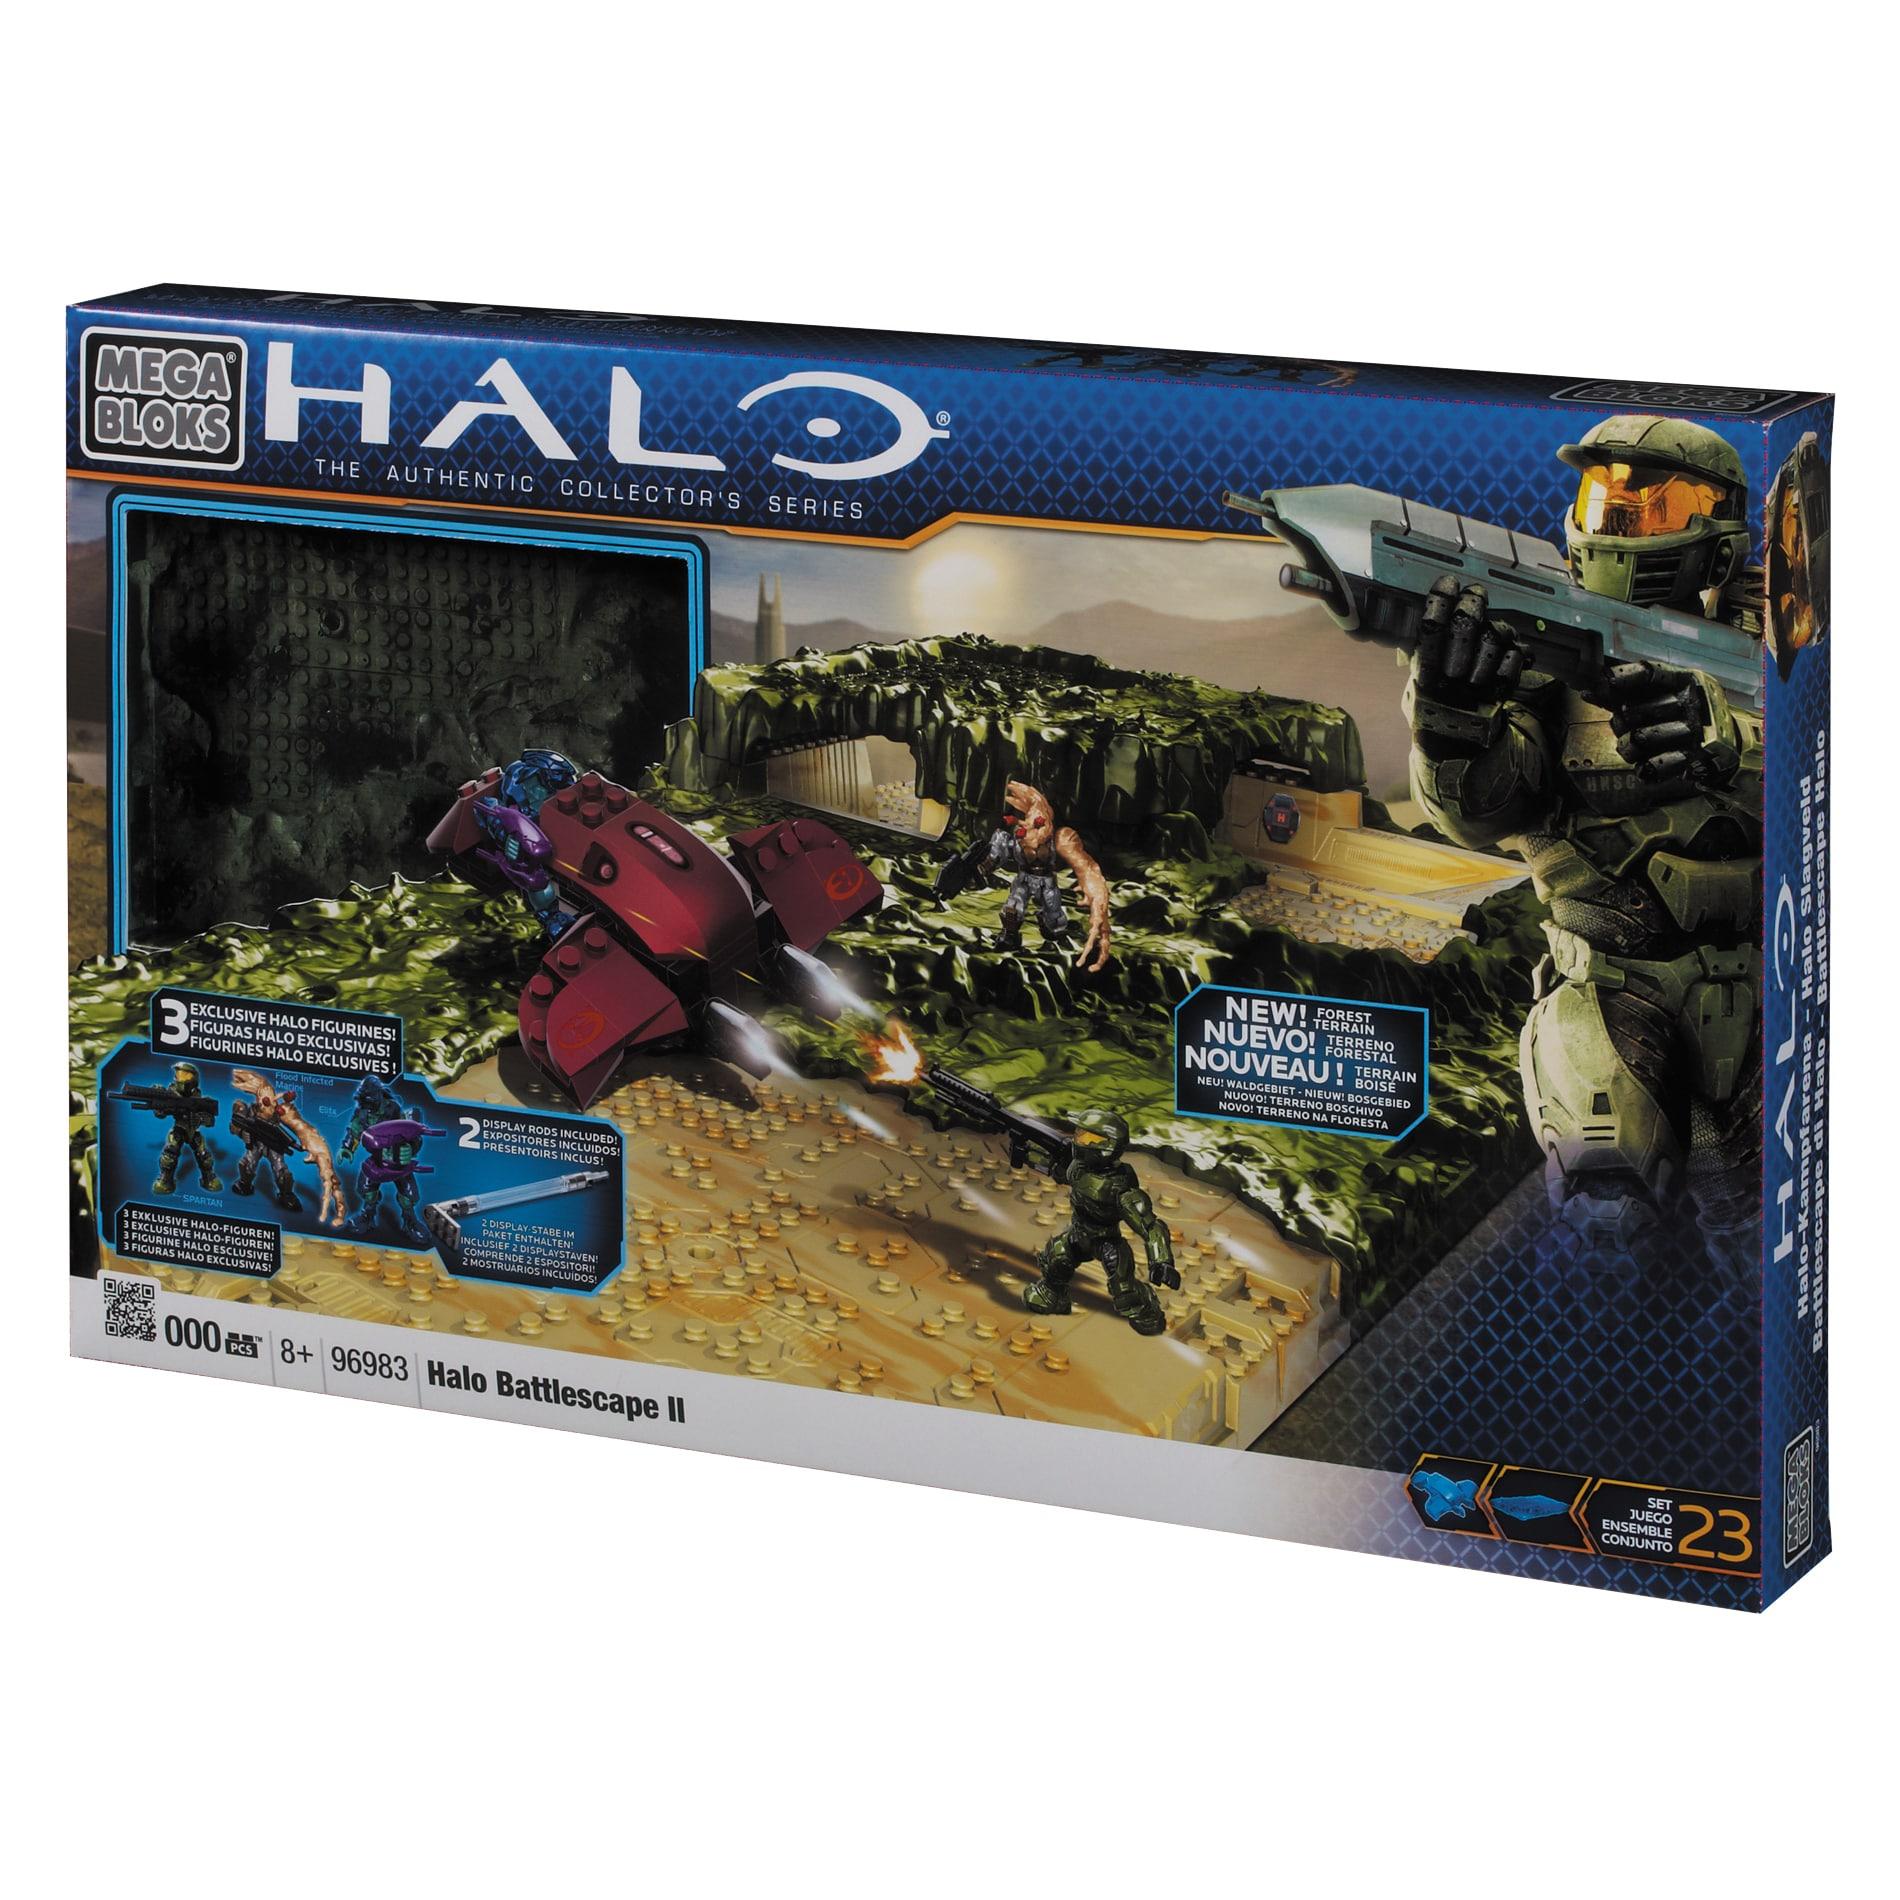 Mega Bloks Build and Expand Halo Battlescape II F Creative Playset